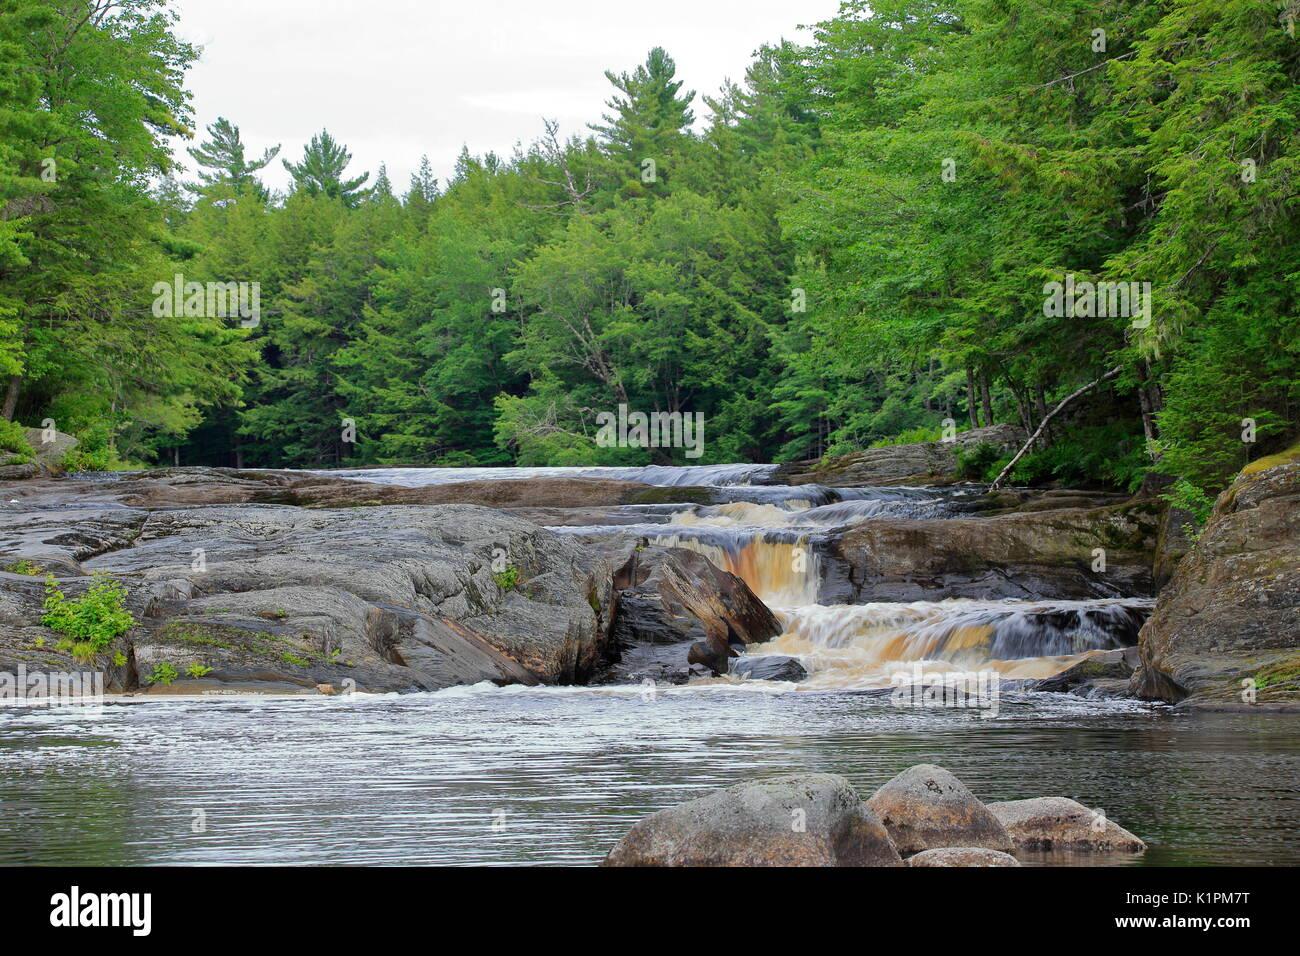 Mill Falls in Kejimkujik National Park in Nova Scotia, Canada - Stock Image